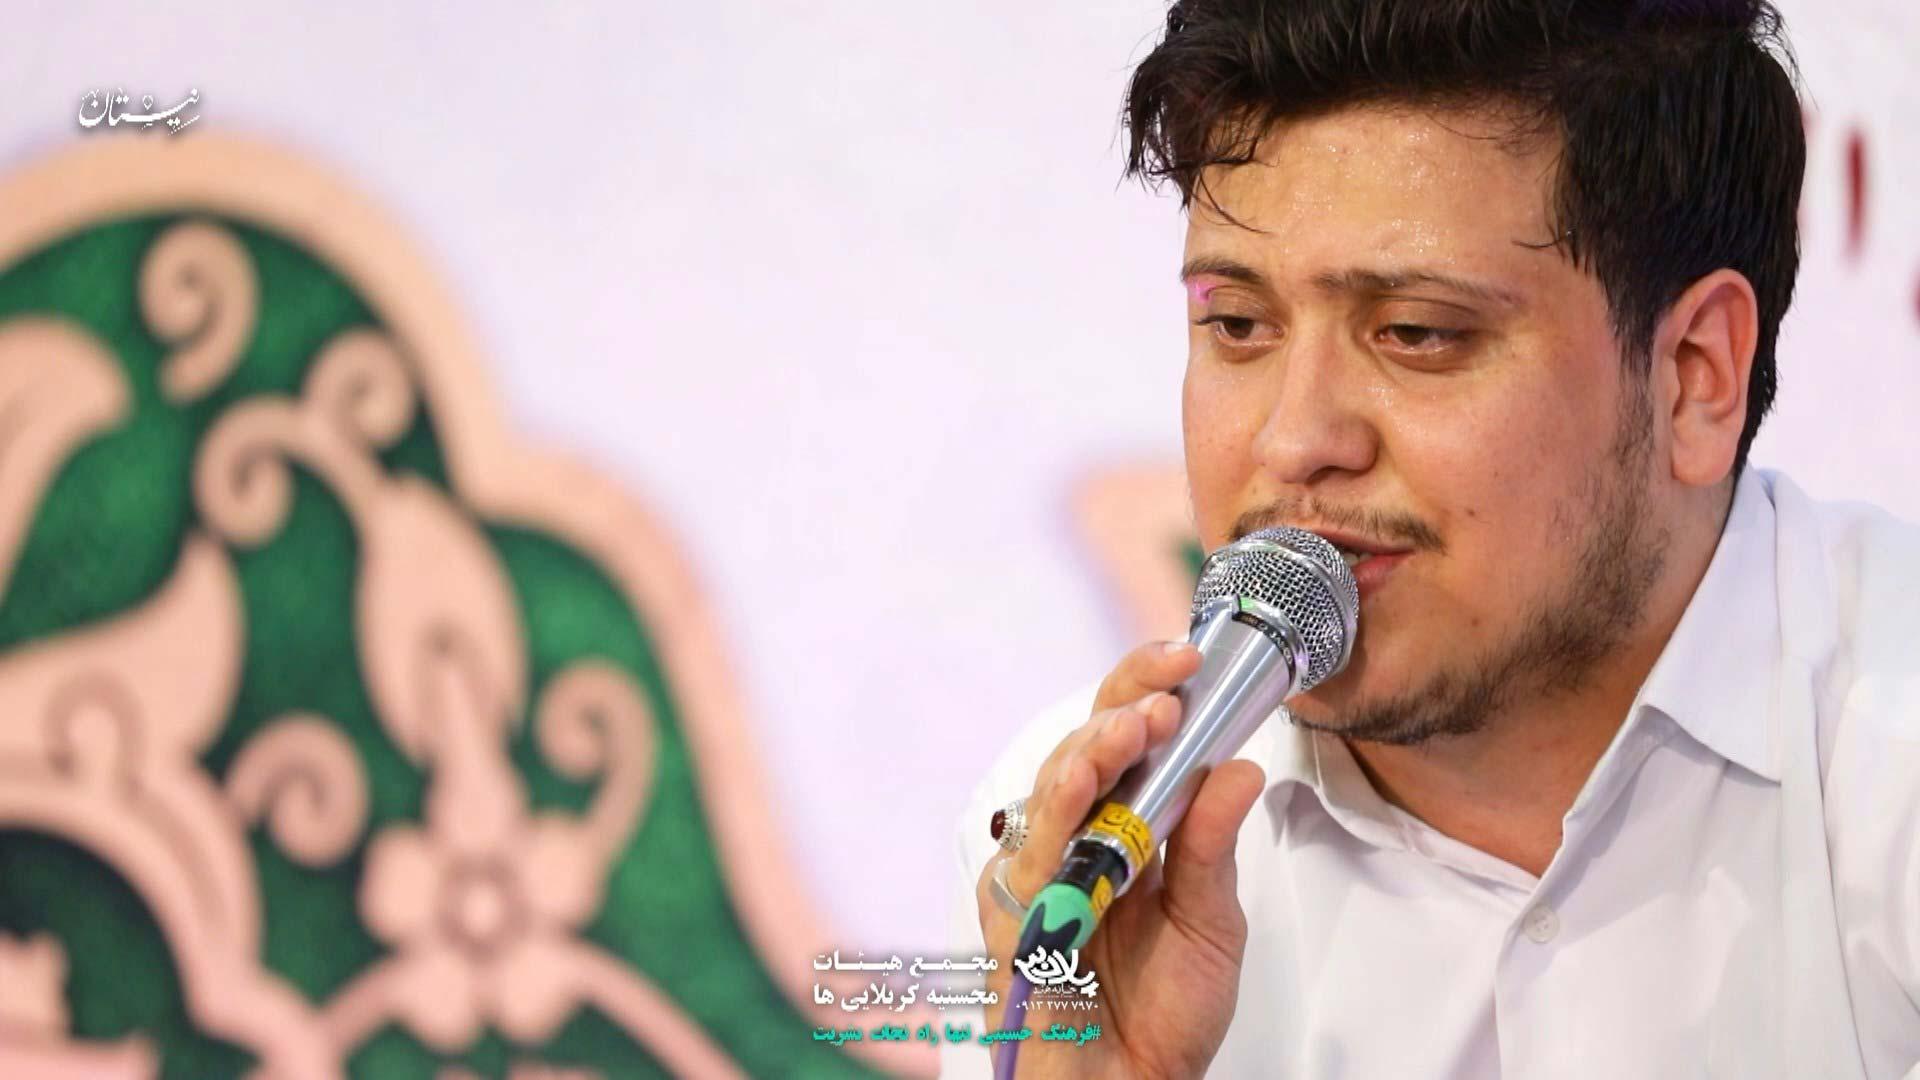 میزنه قلبم محمد رضا ناصری